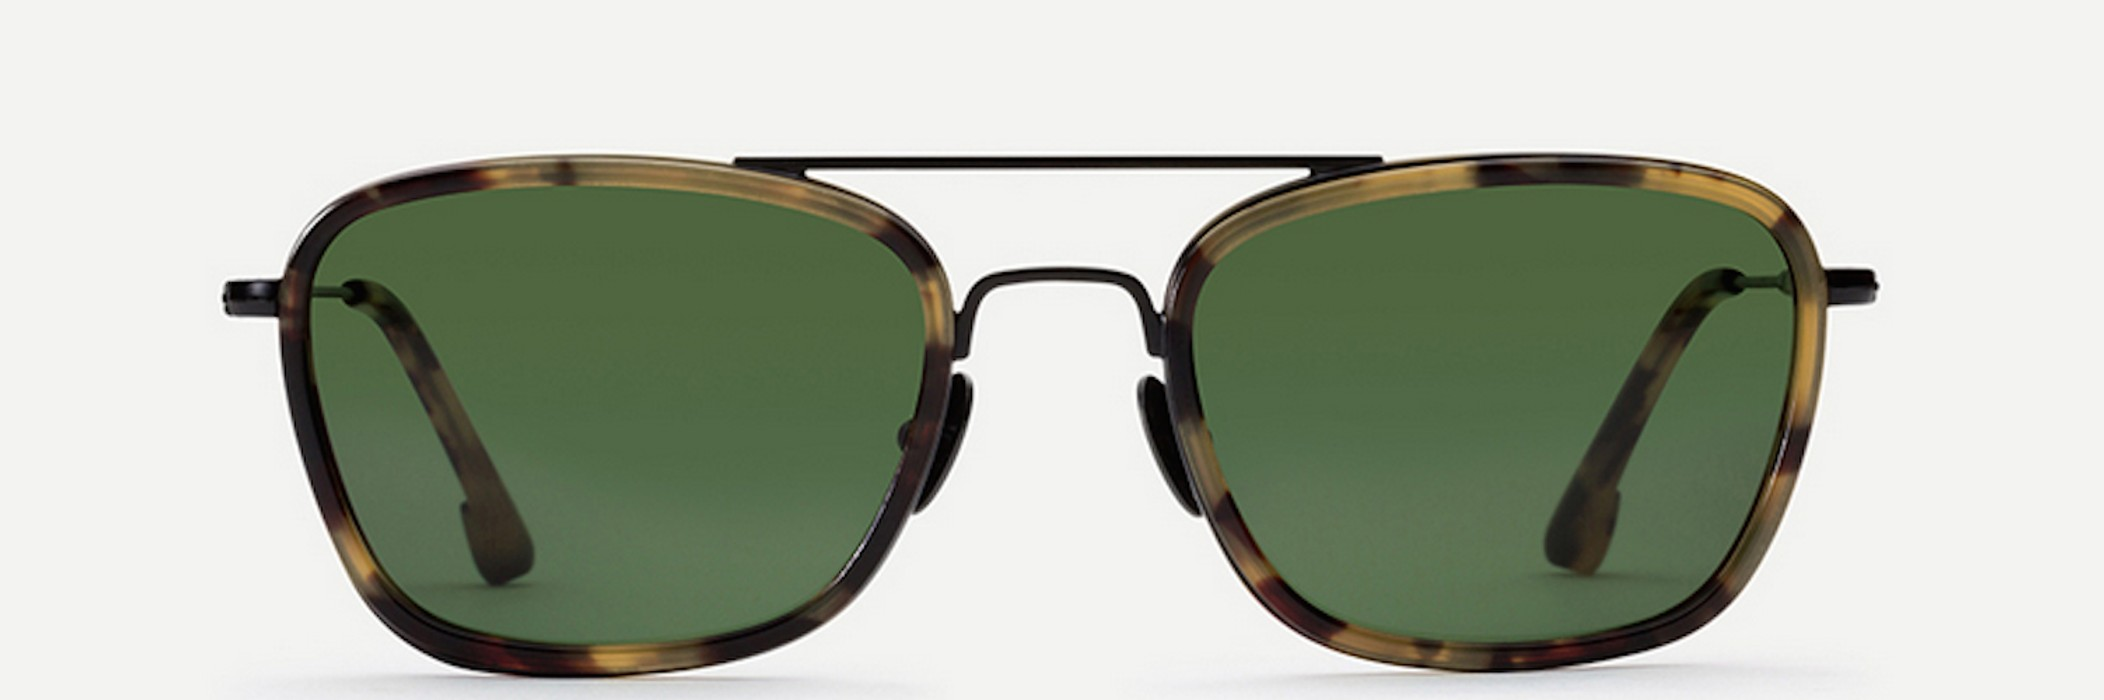 6f5eab0259e38 Steven Alan Newport Sunglasses Size one size - Glasses for Sale ...